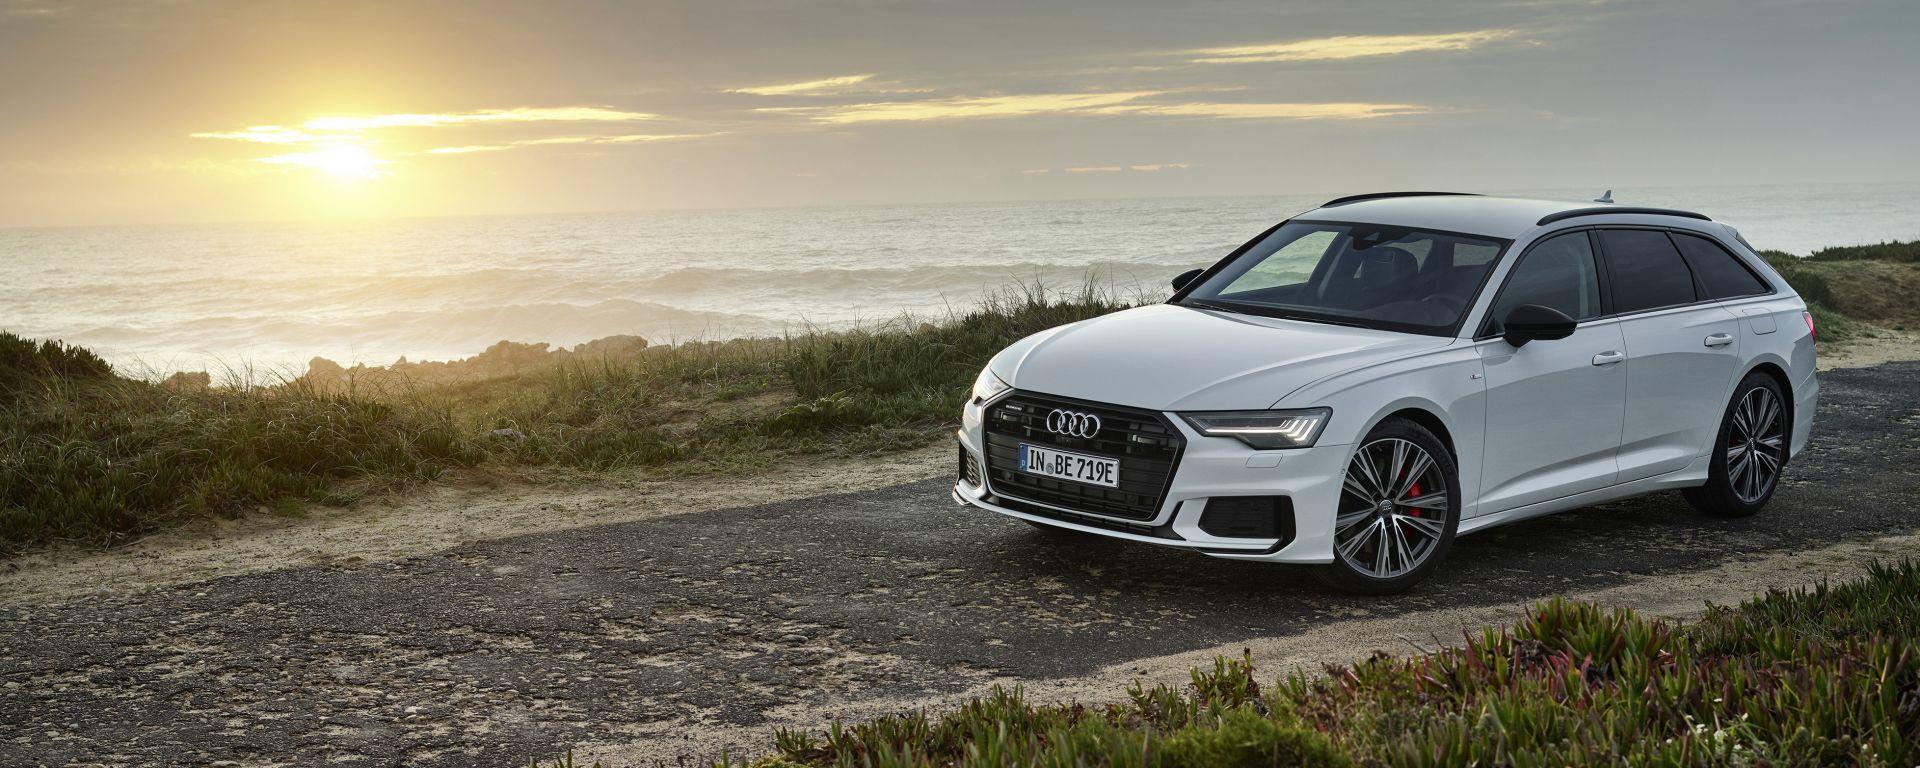 Audi Avant TFSI e quattro arriverà nel terzo trimestre 2020